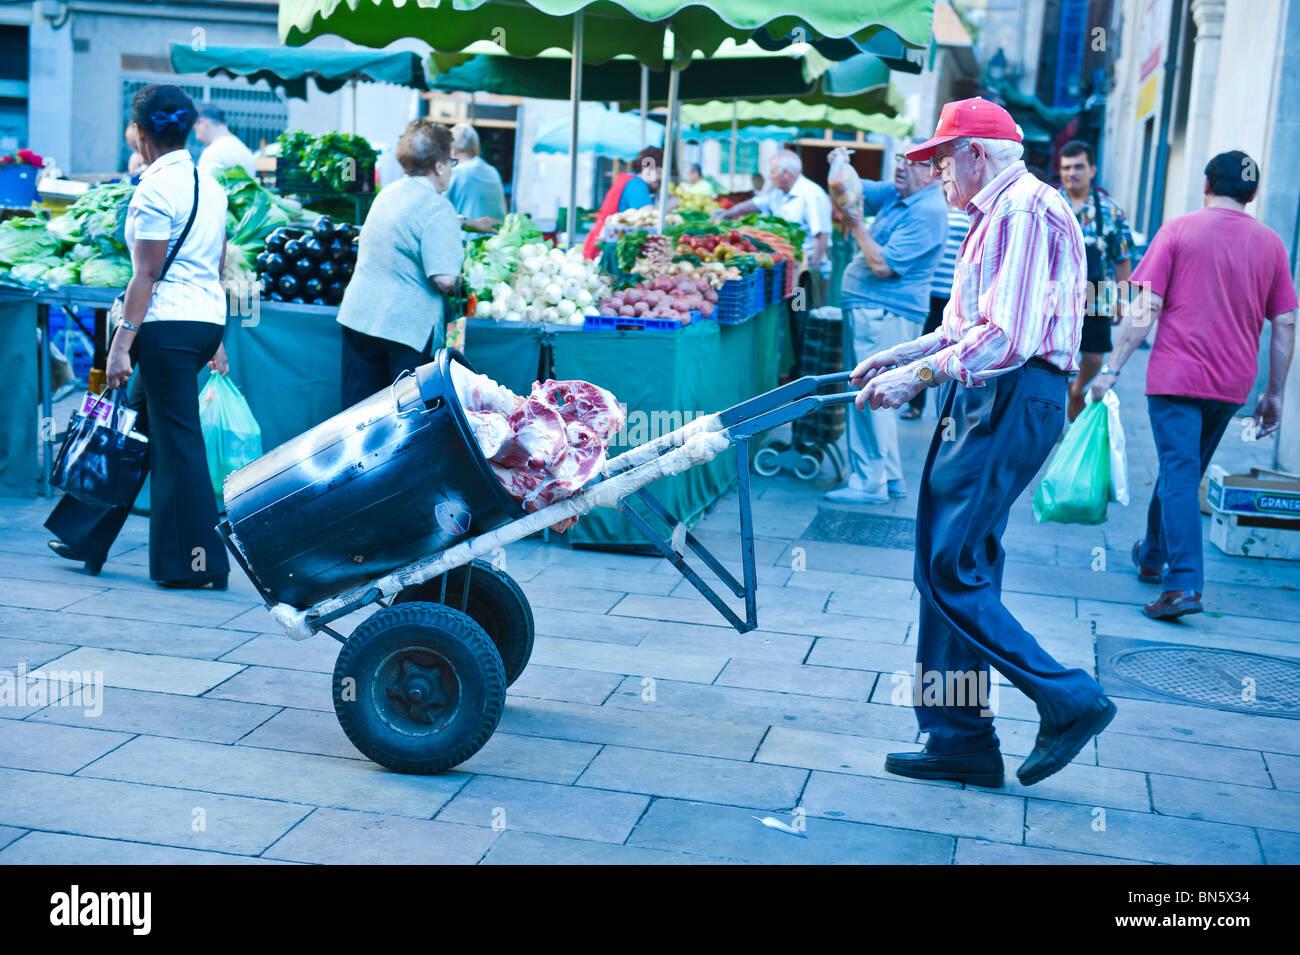 Old local man carrying meat in the market of La Boqueria in las Ramblas of Barcelona, Spain. - Stock Image